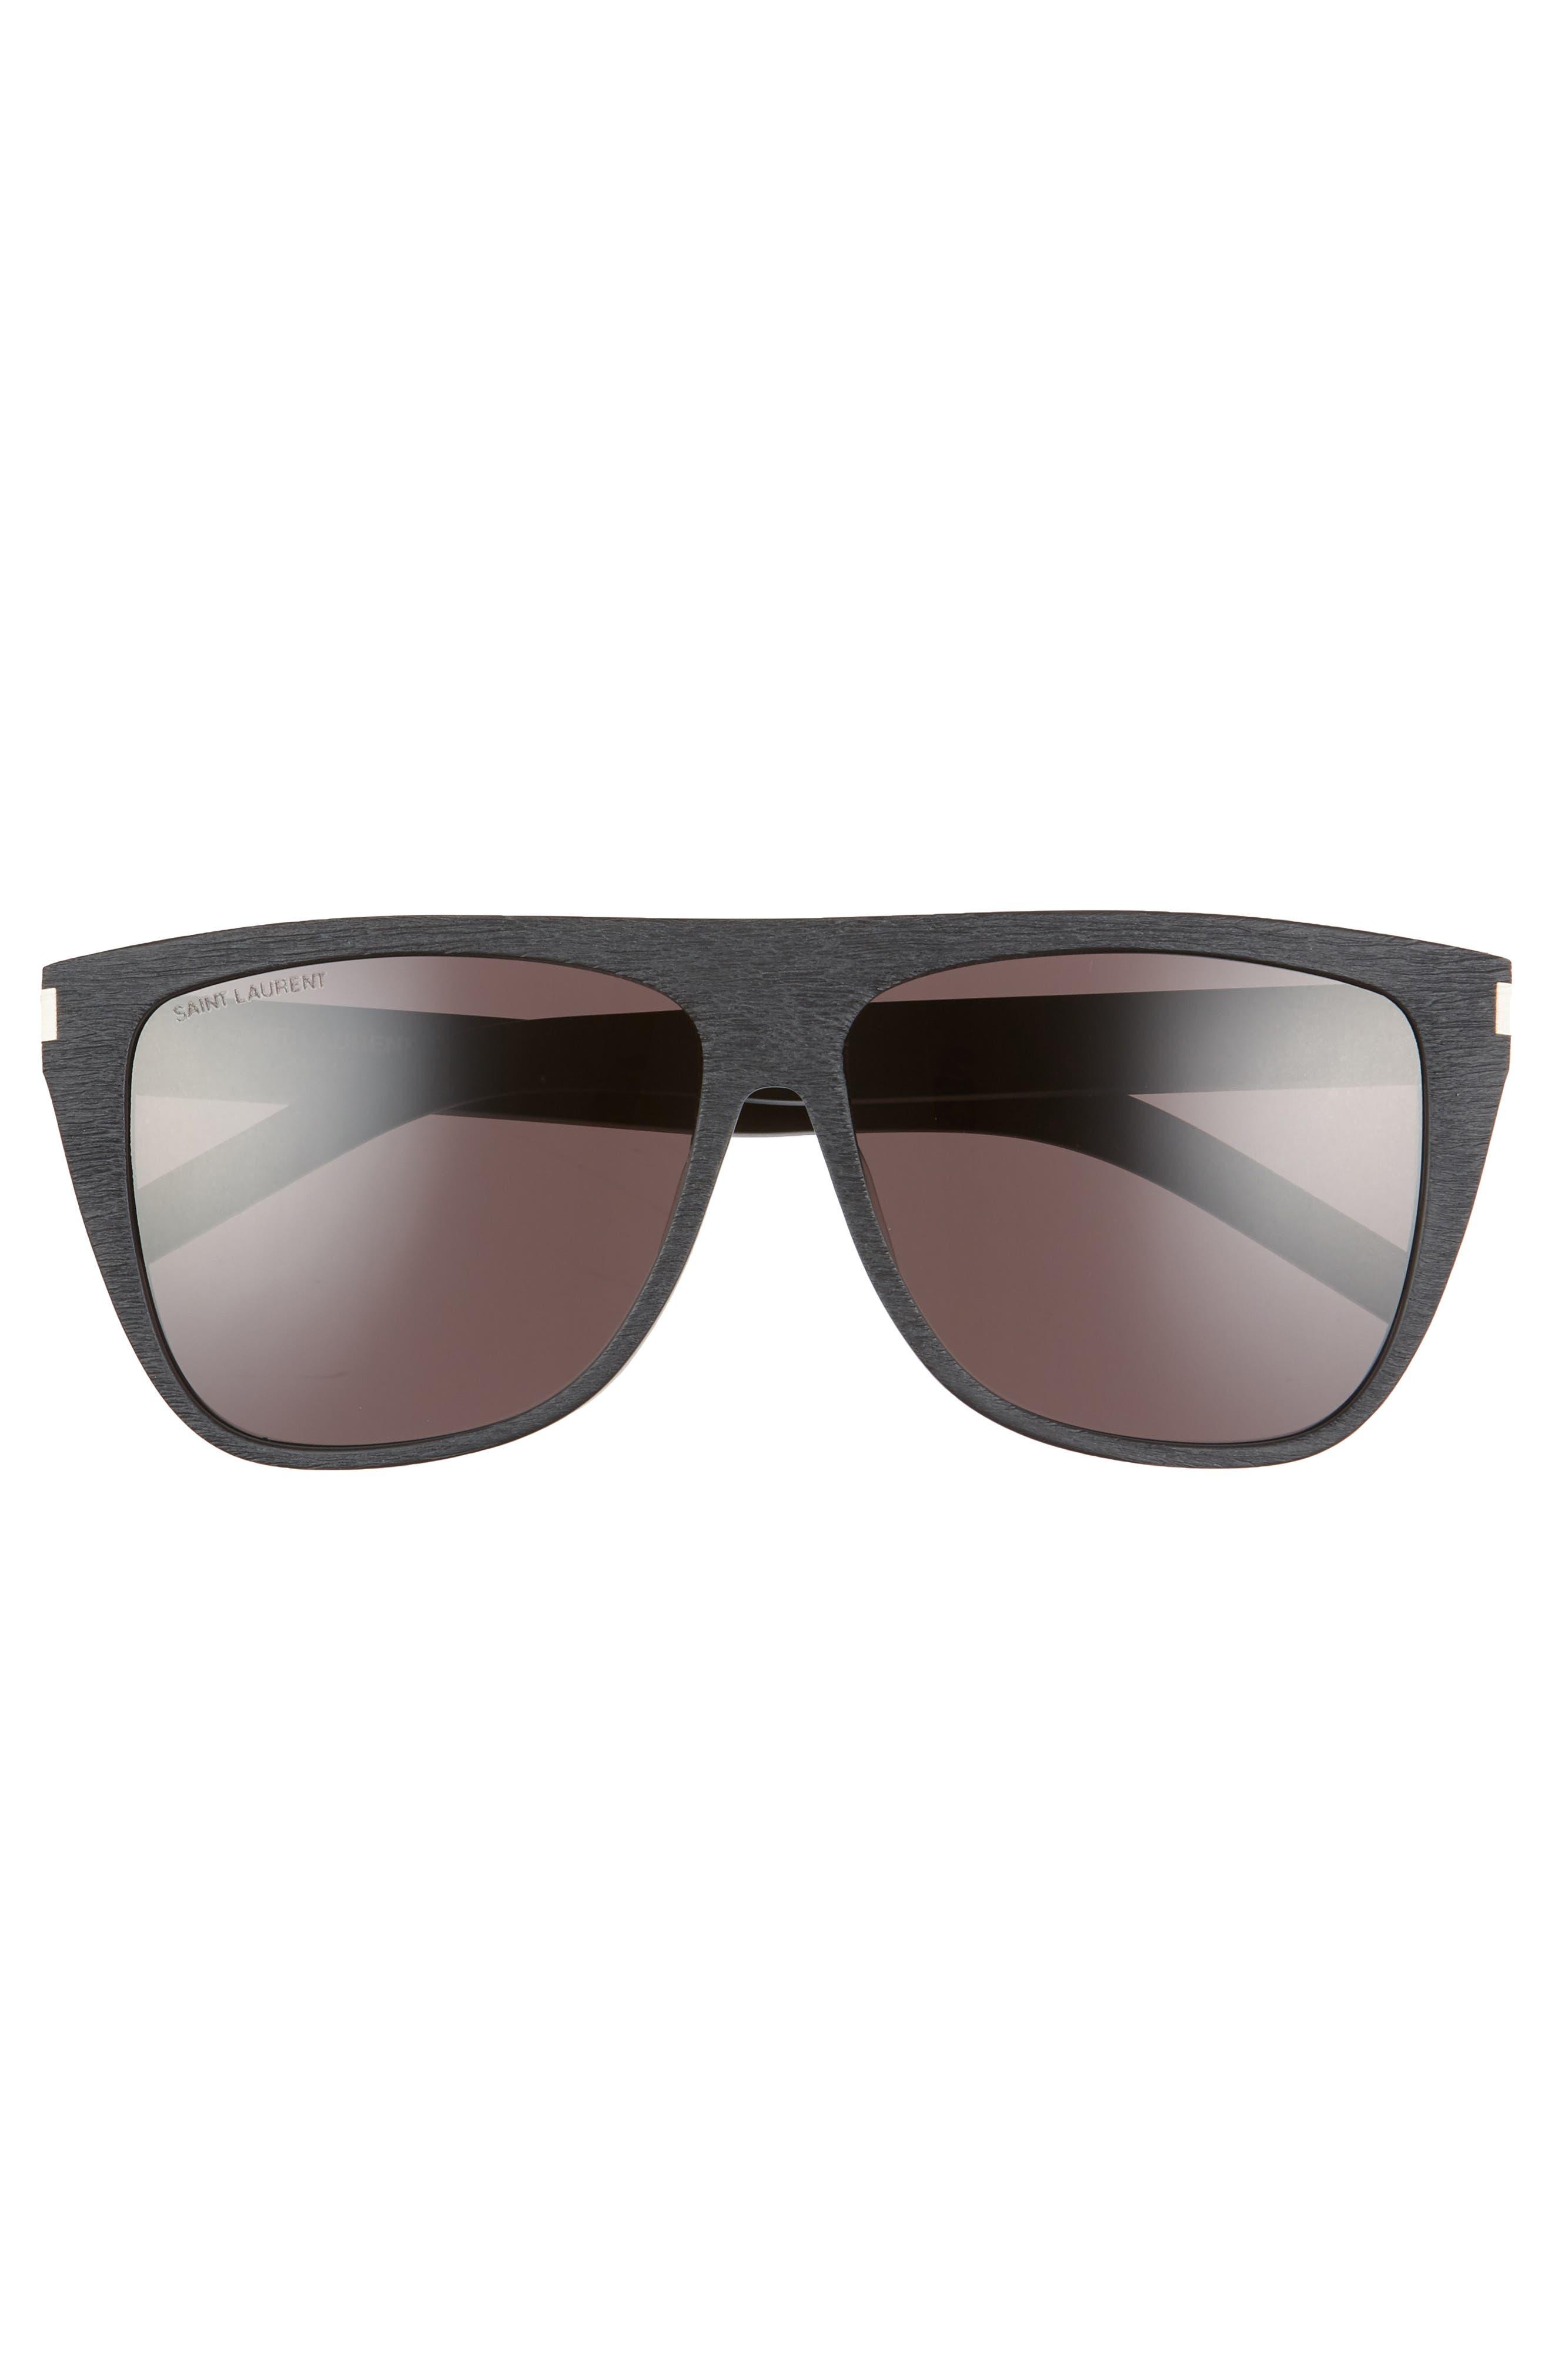 SAINT LAURENT, 59mm Sunglasses, Alternate thumbnail 3, color, WOOD EFFECT BLACK/ GREY SOLID